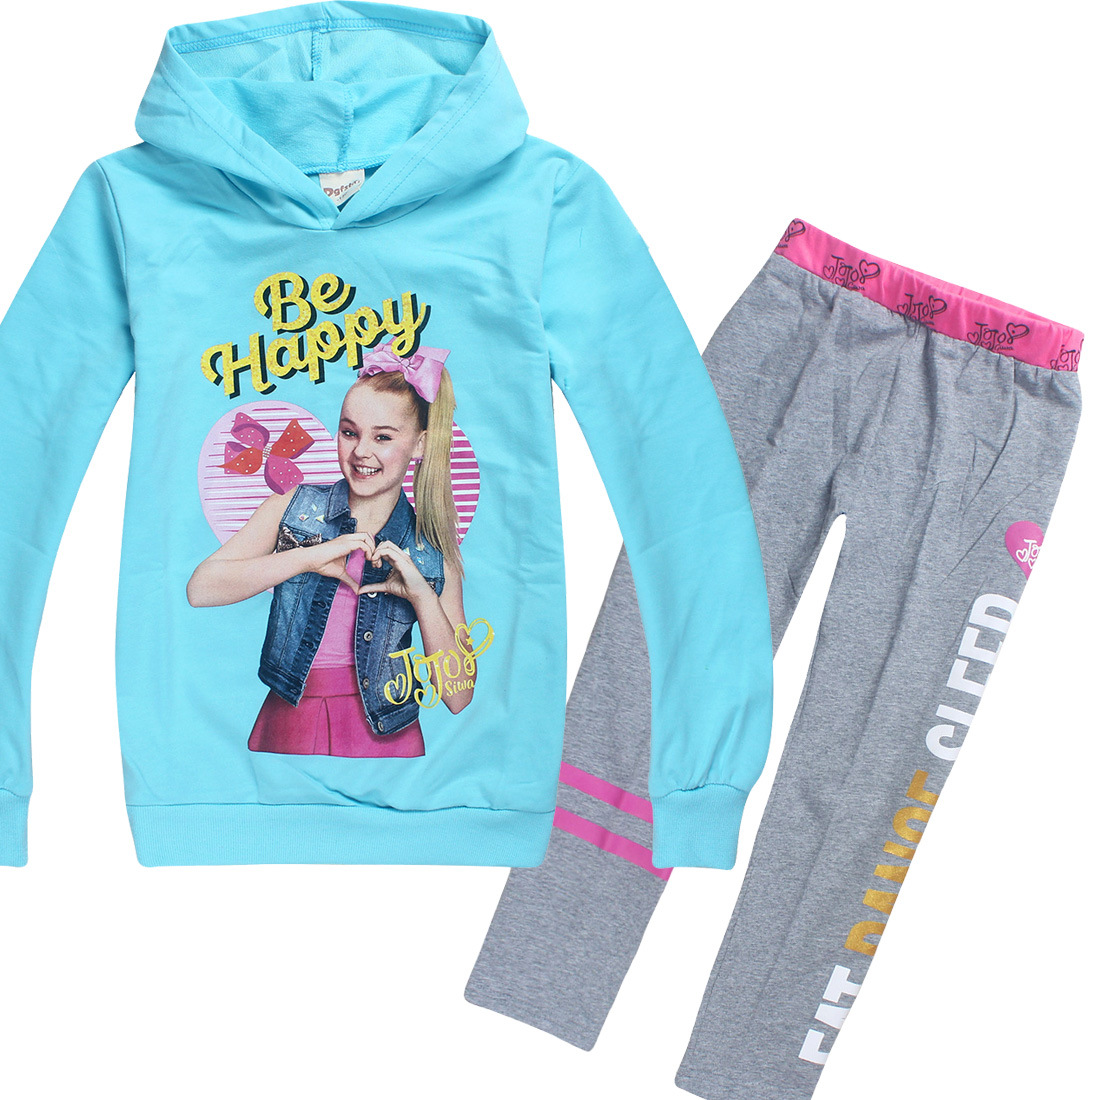 Jojo Siwa Girls Zipper Hoodie Casual Clothes Top /& Cotton Trousers Outfit Set